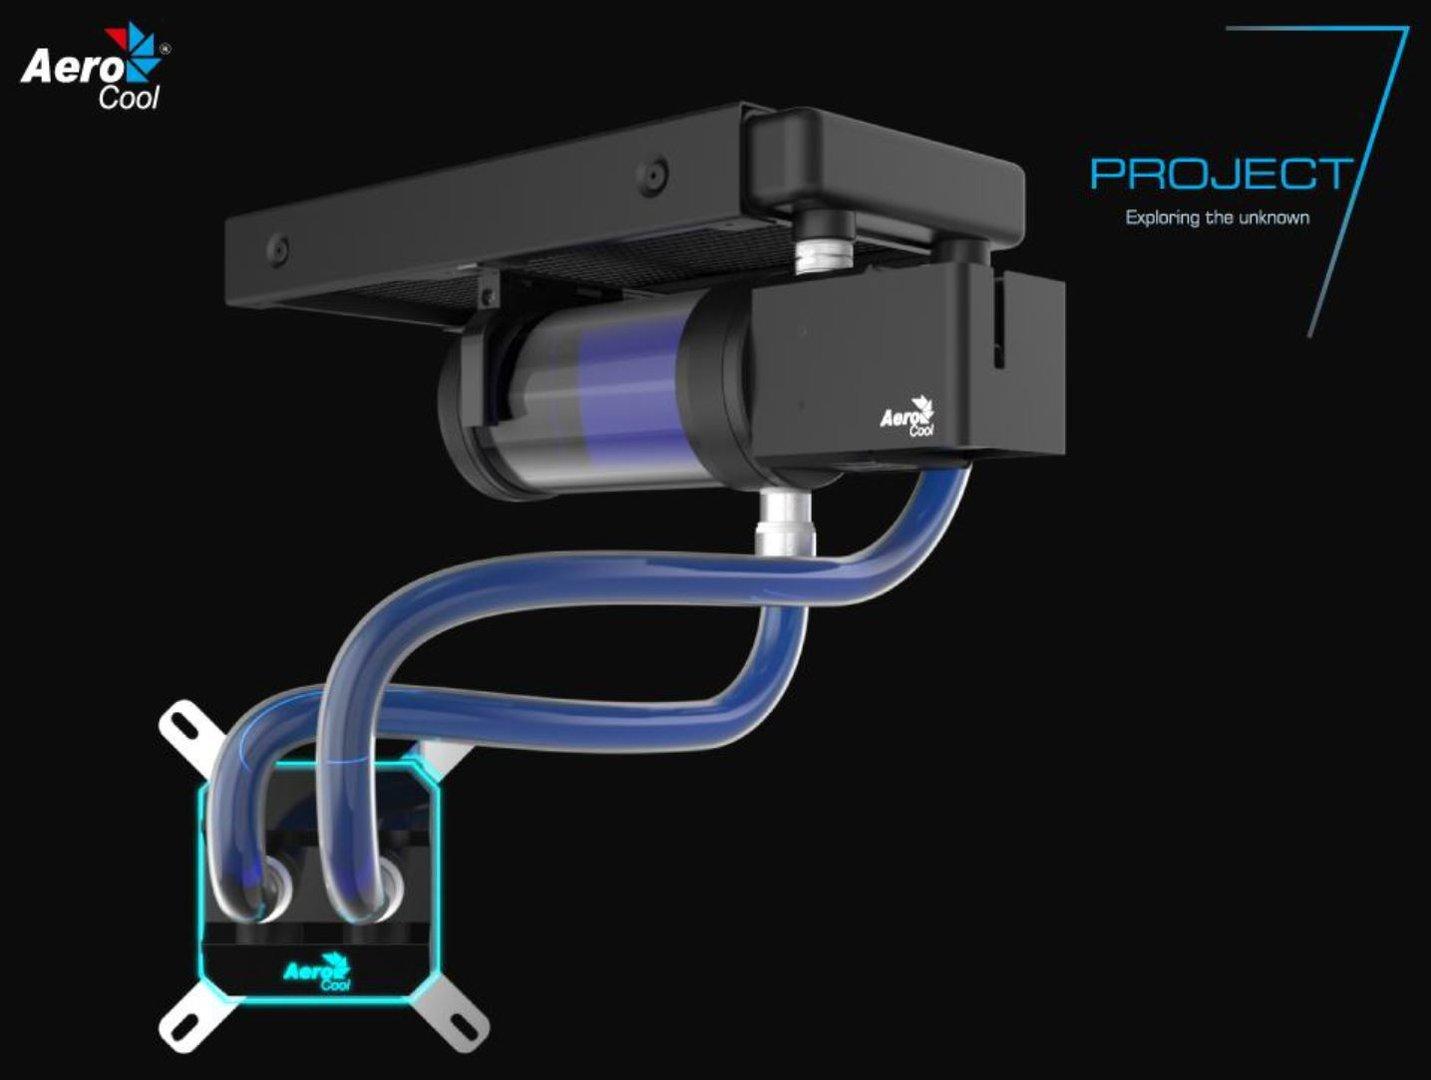 Aerocool P7-W Pro